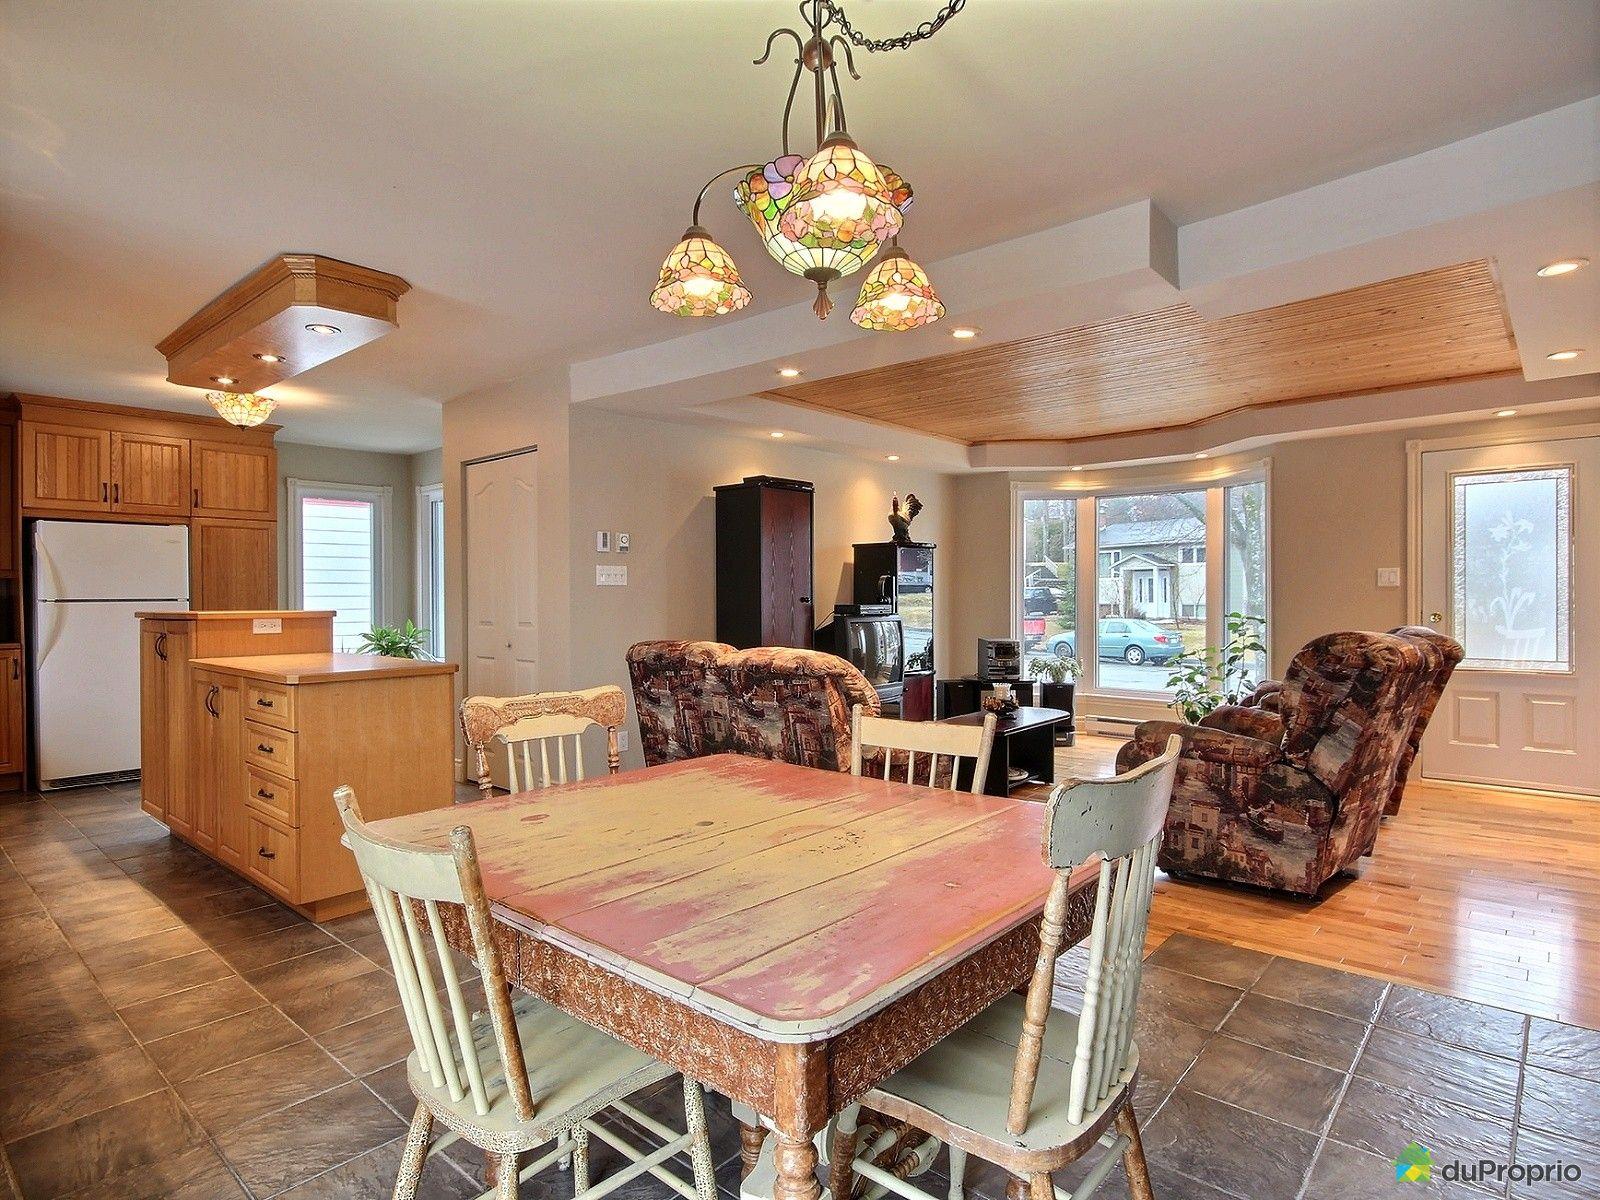 Maison Vendre Rock Forest 4305 Rue Cayer Immobilier